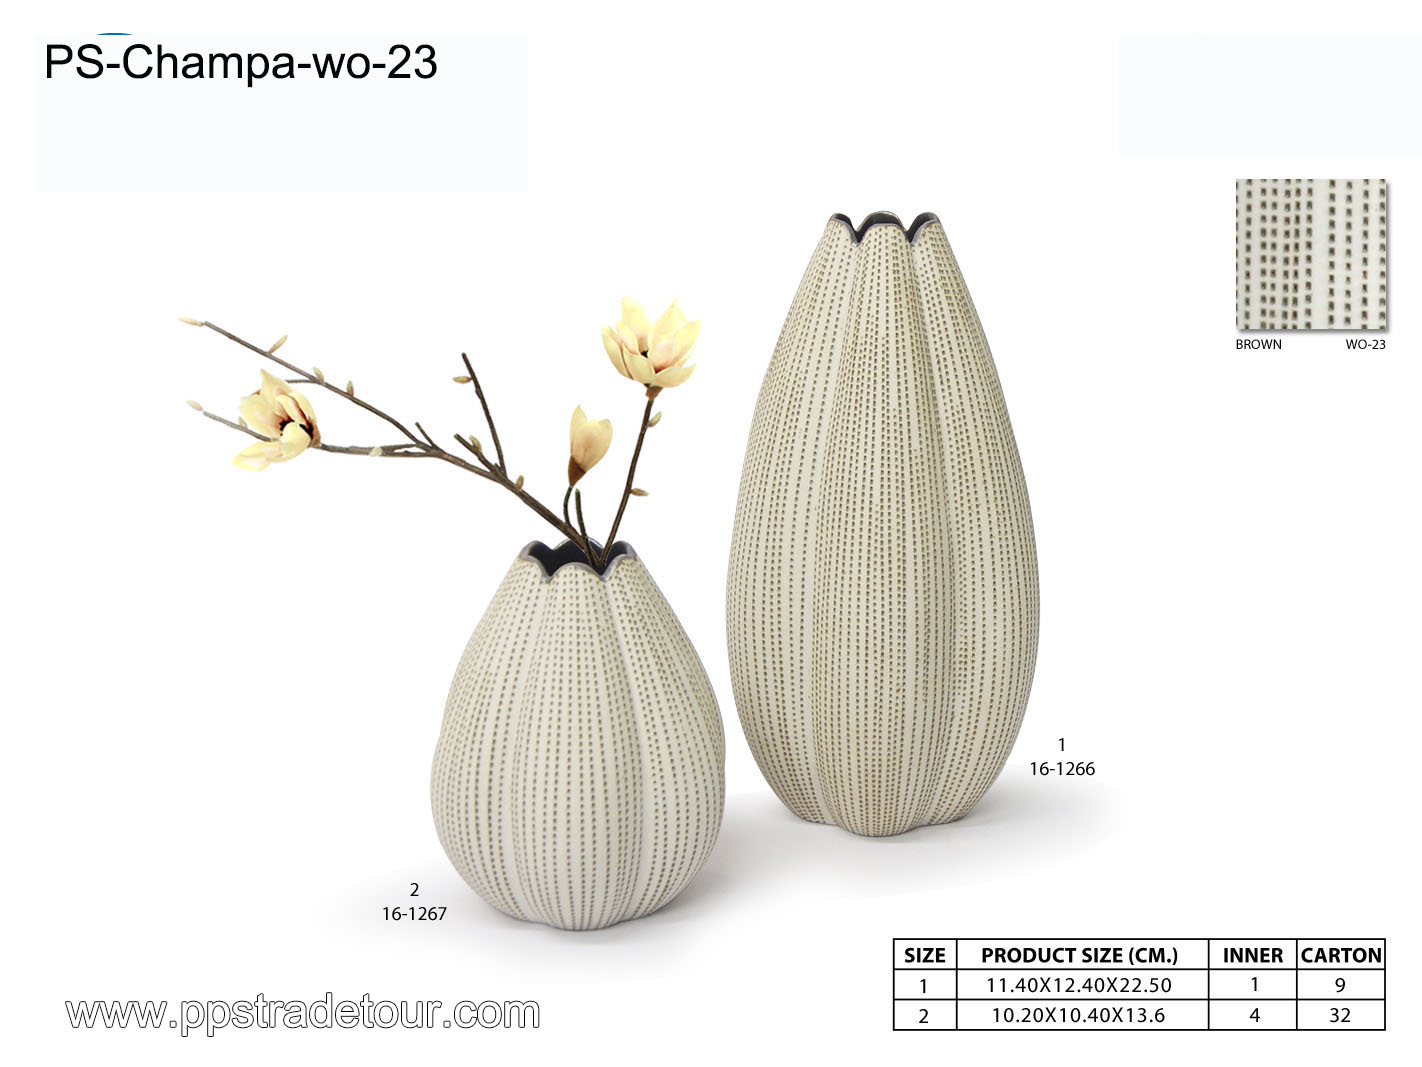 PSCV-Champa-wo-23